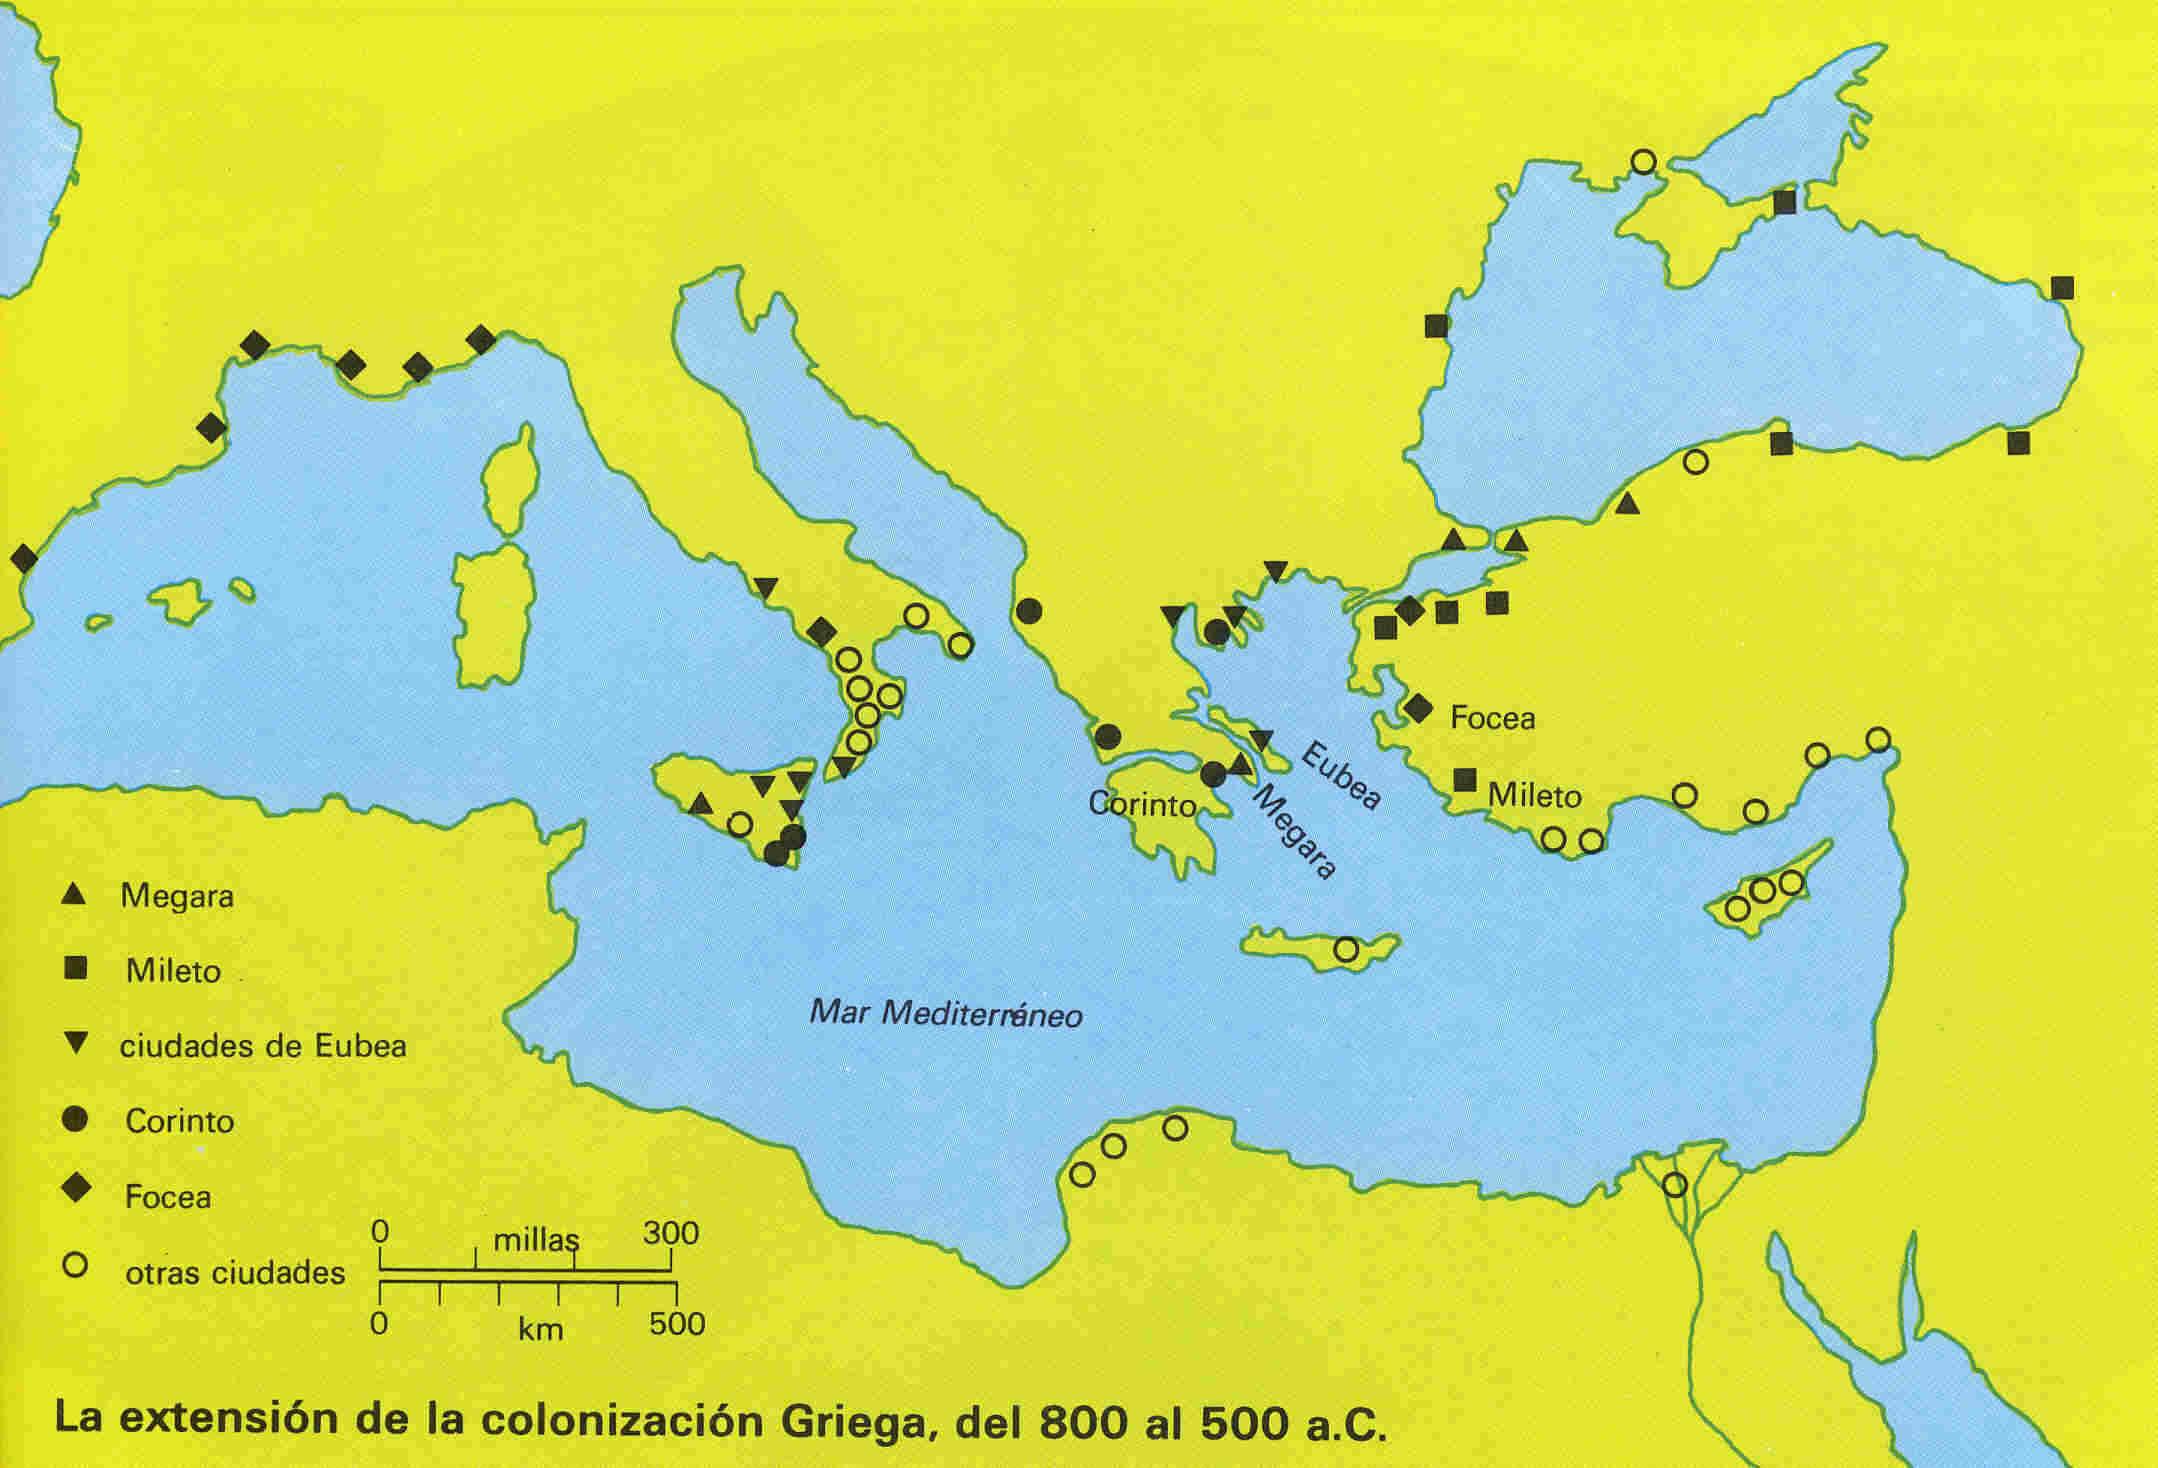 Tiempos oscuros Neolitico e invasiones de Grecia clasica 2